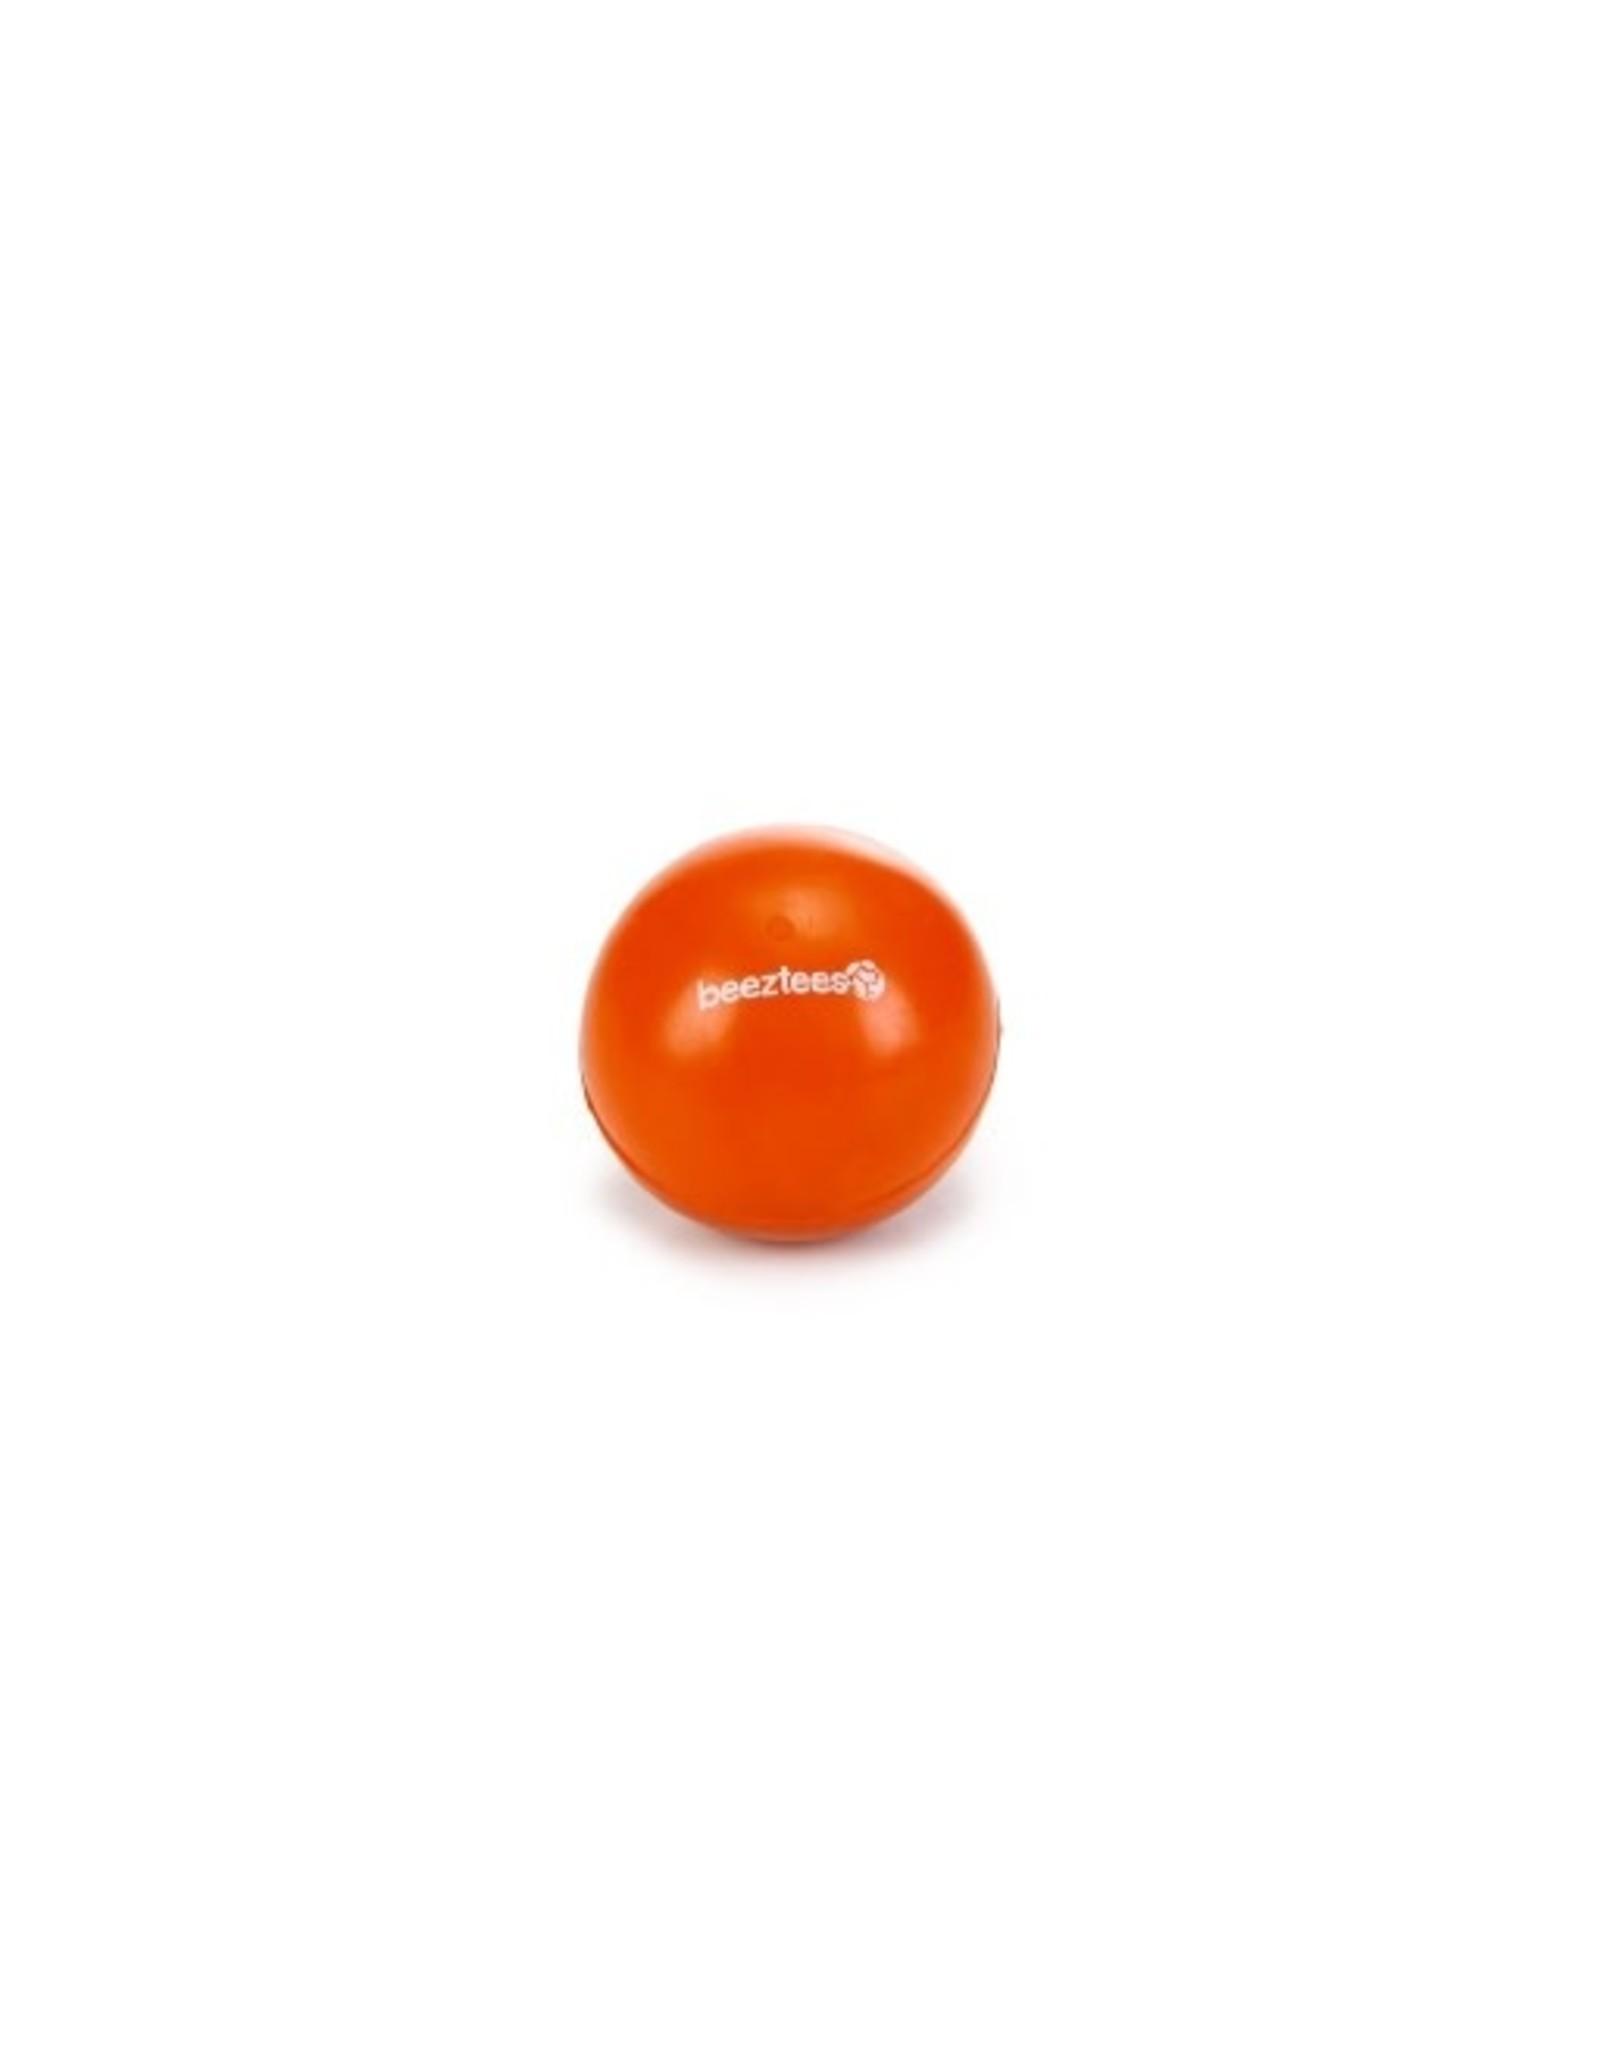 Beeztees Beeztees rubber bal massief, oranje 5 cm